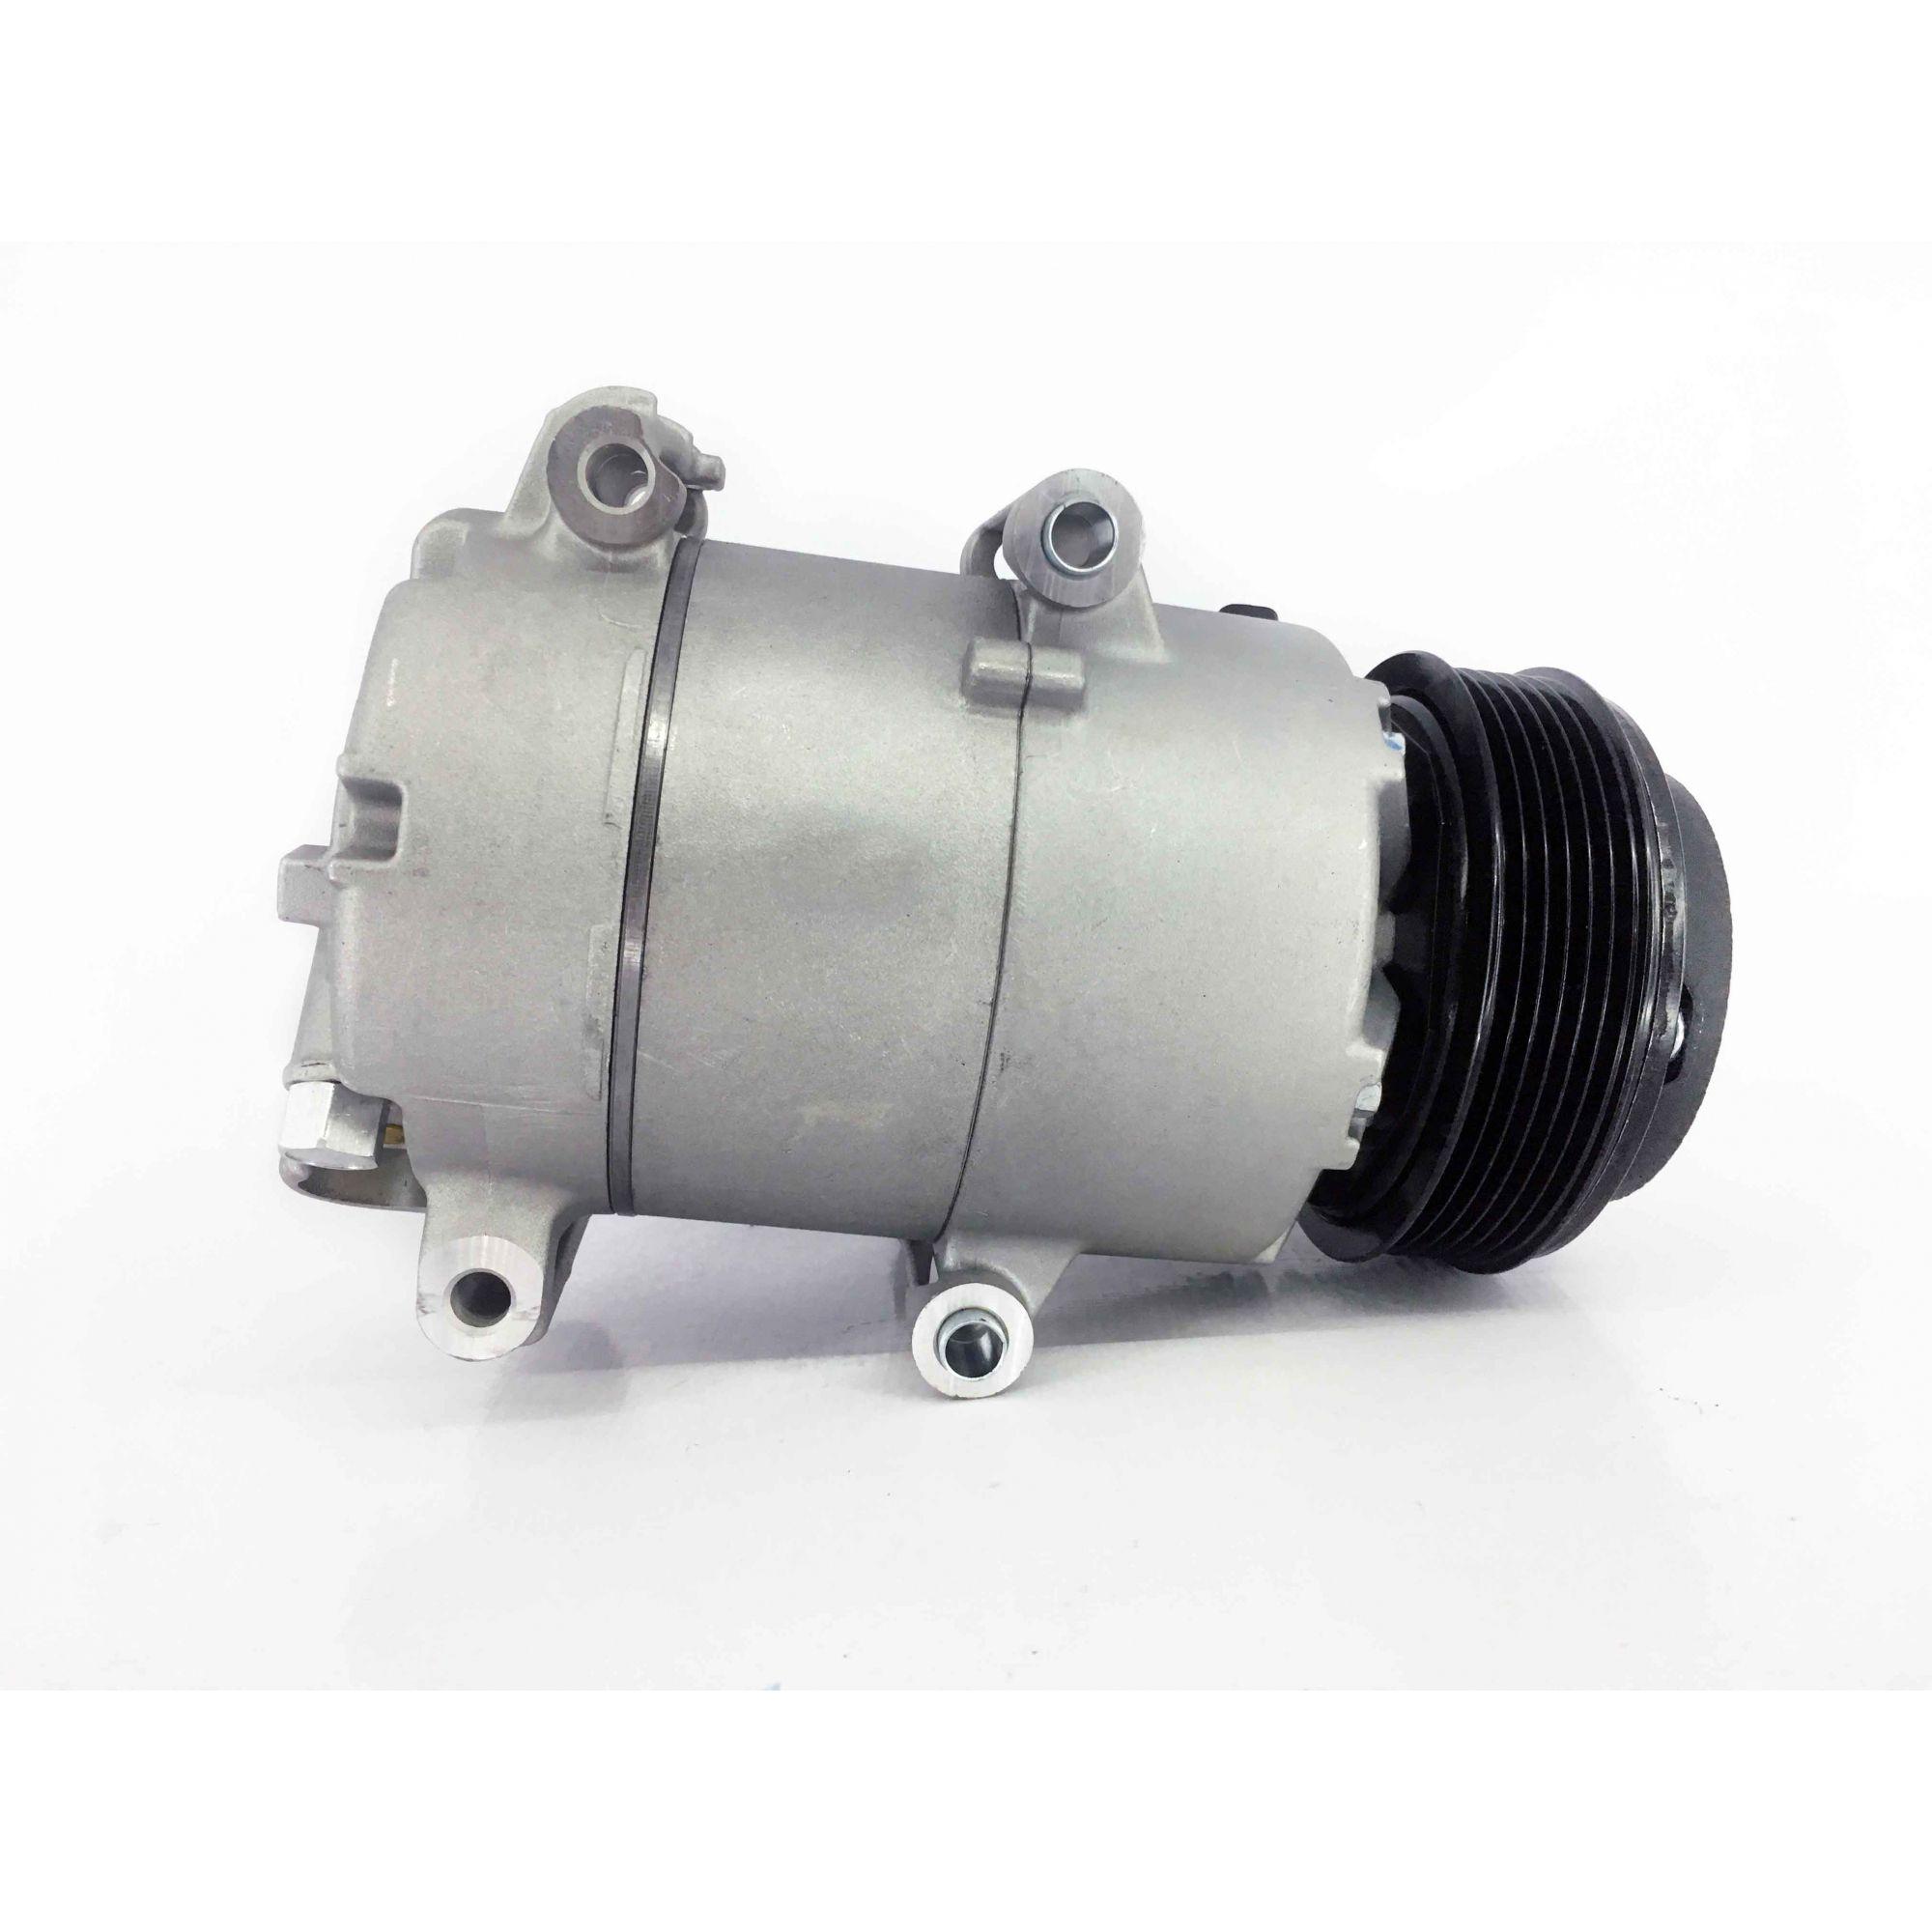 Compressor New Fiesta / Ecosport / Focus - Original DELPHI